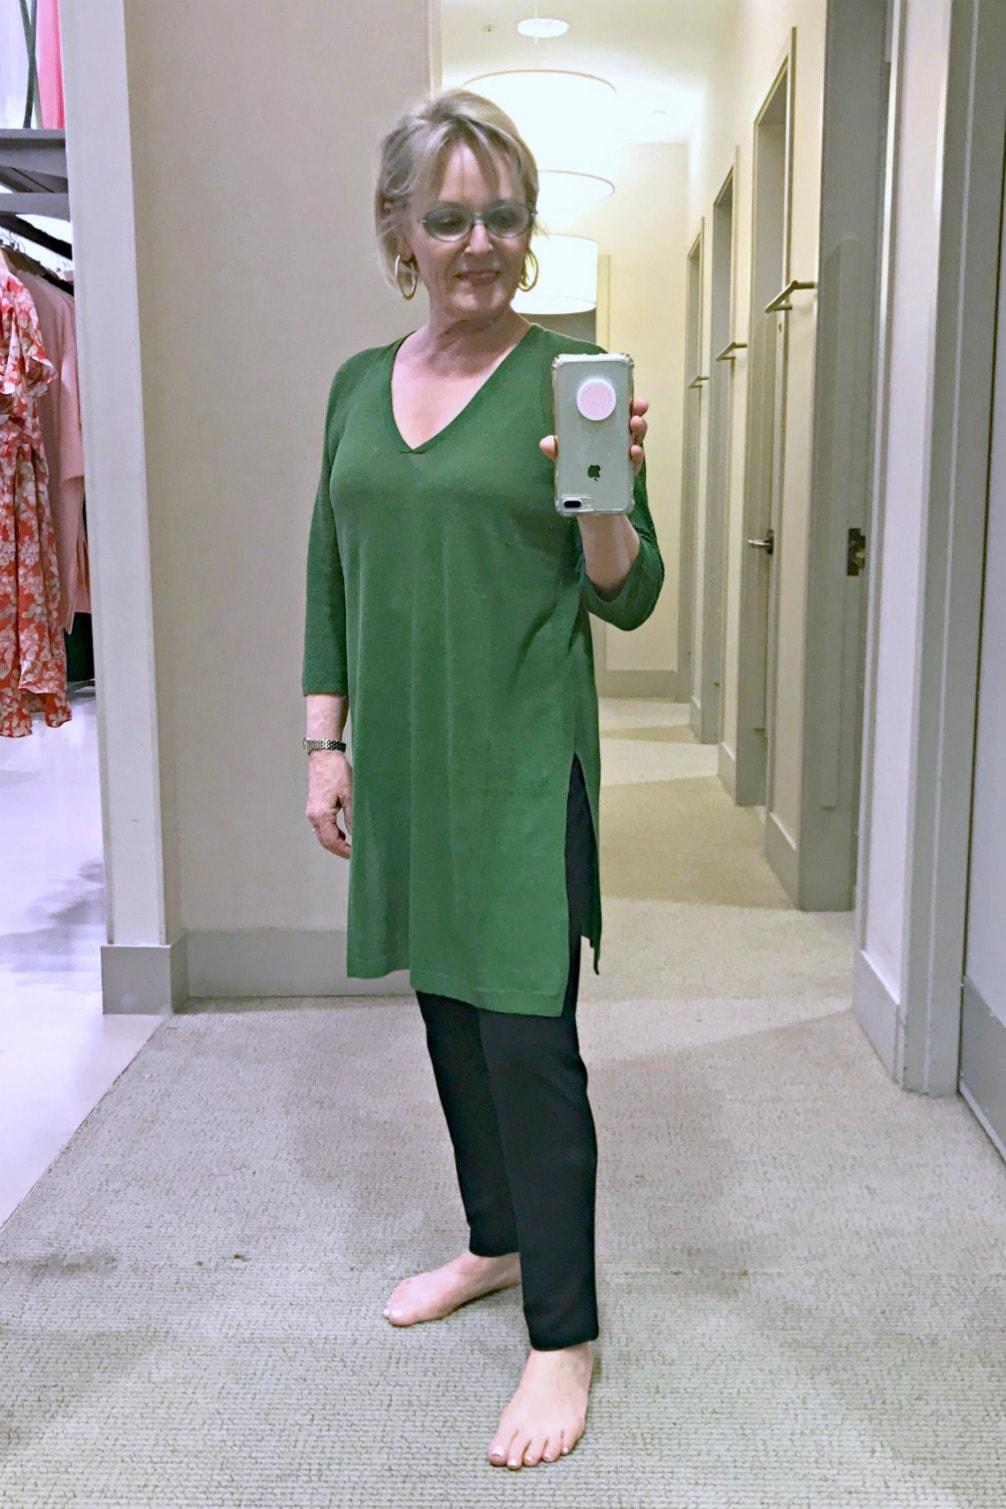 Over 50 style blogger Jennifer Connolly wears J. Jill linen tunic in green over black slim pants